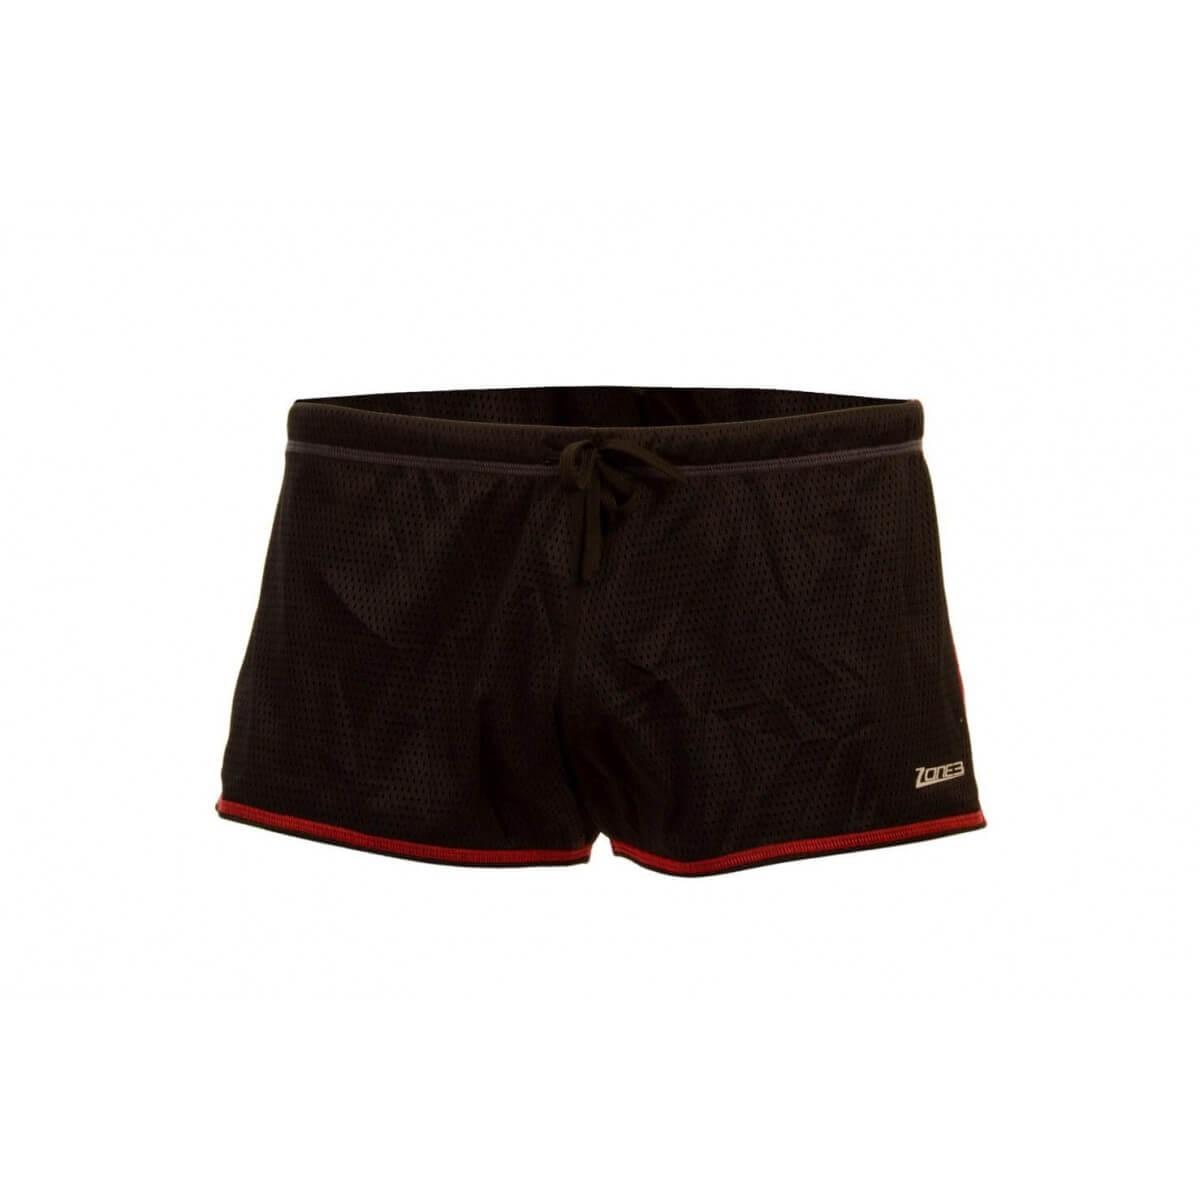 Hombre Shorts 3 Arrastre Bañador De Drag Zone b6fg7y